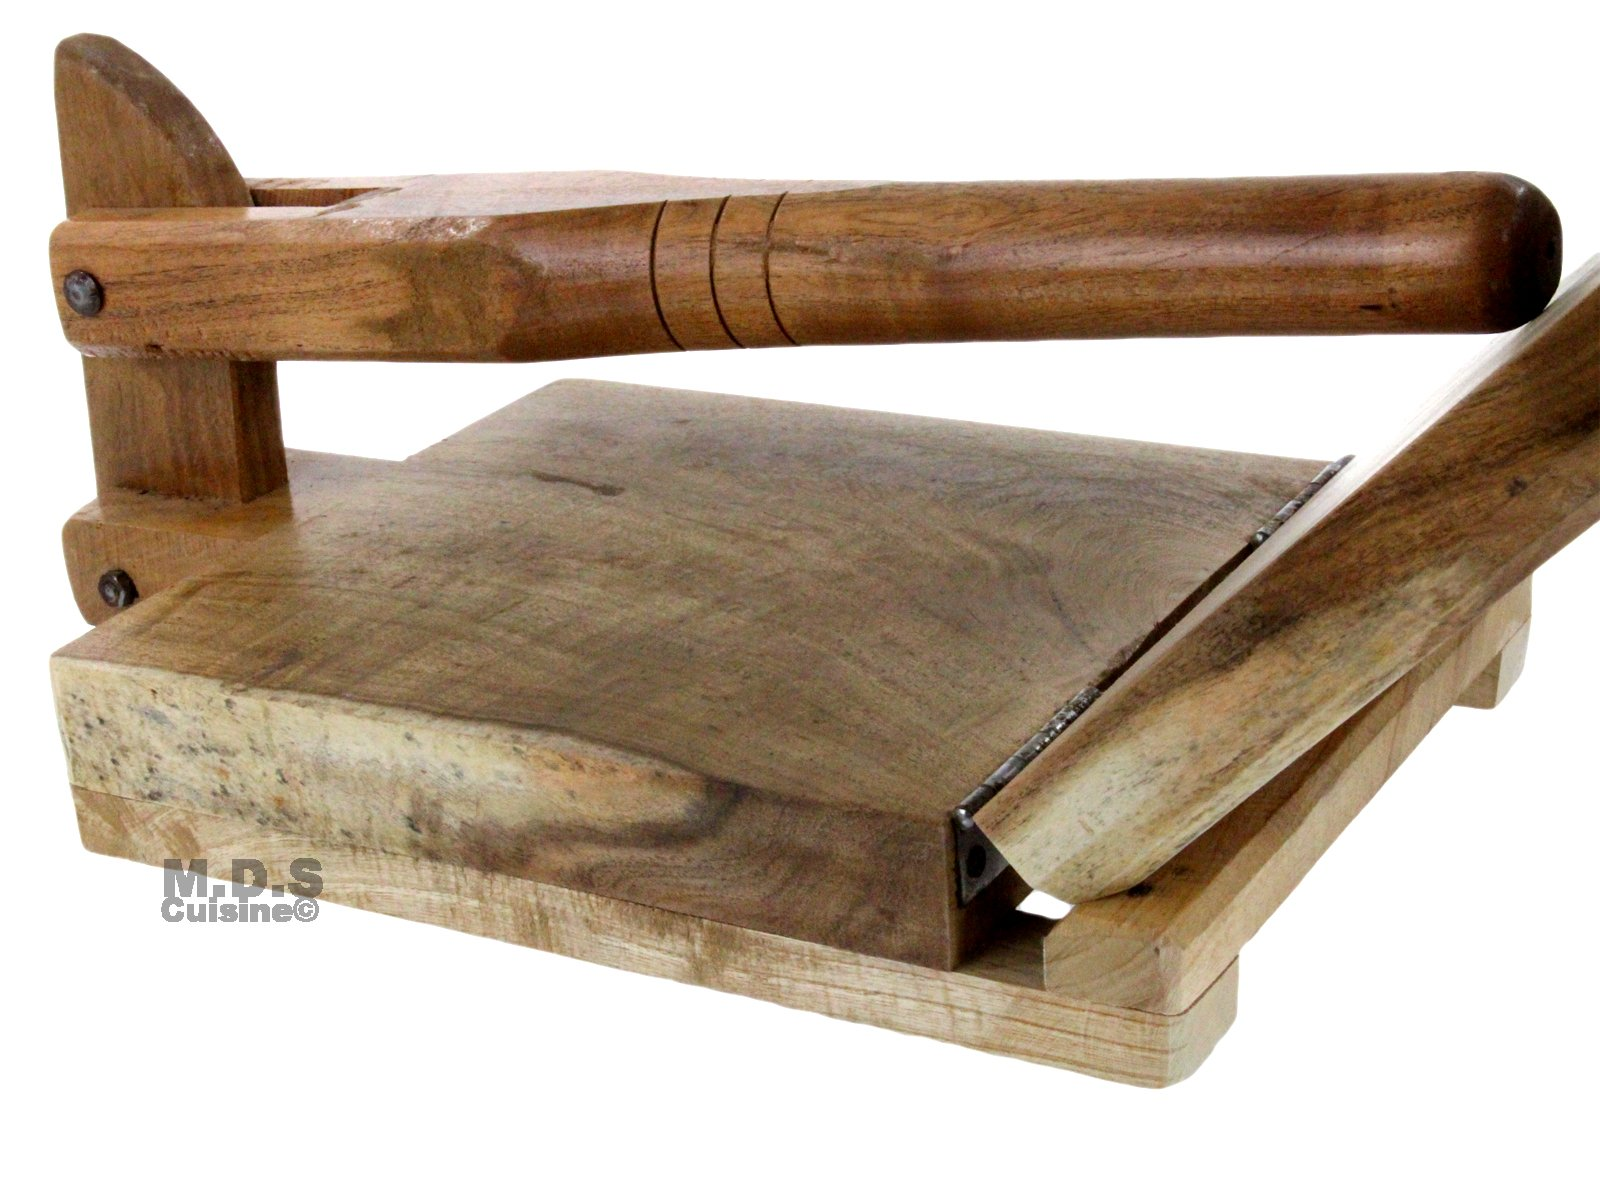 Tortilla Press Wood Tortilladora de Madera Barnizada Mezquite Tortilla Press Heavy Duty 9.5''x 9'' by K&R Kitchen Restaurant Supplies (Image #1)